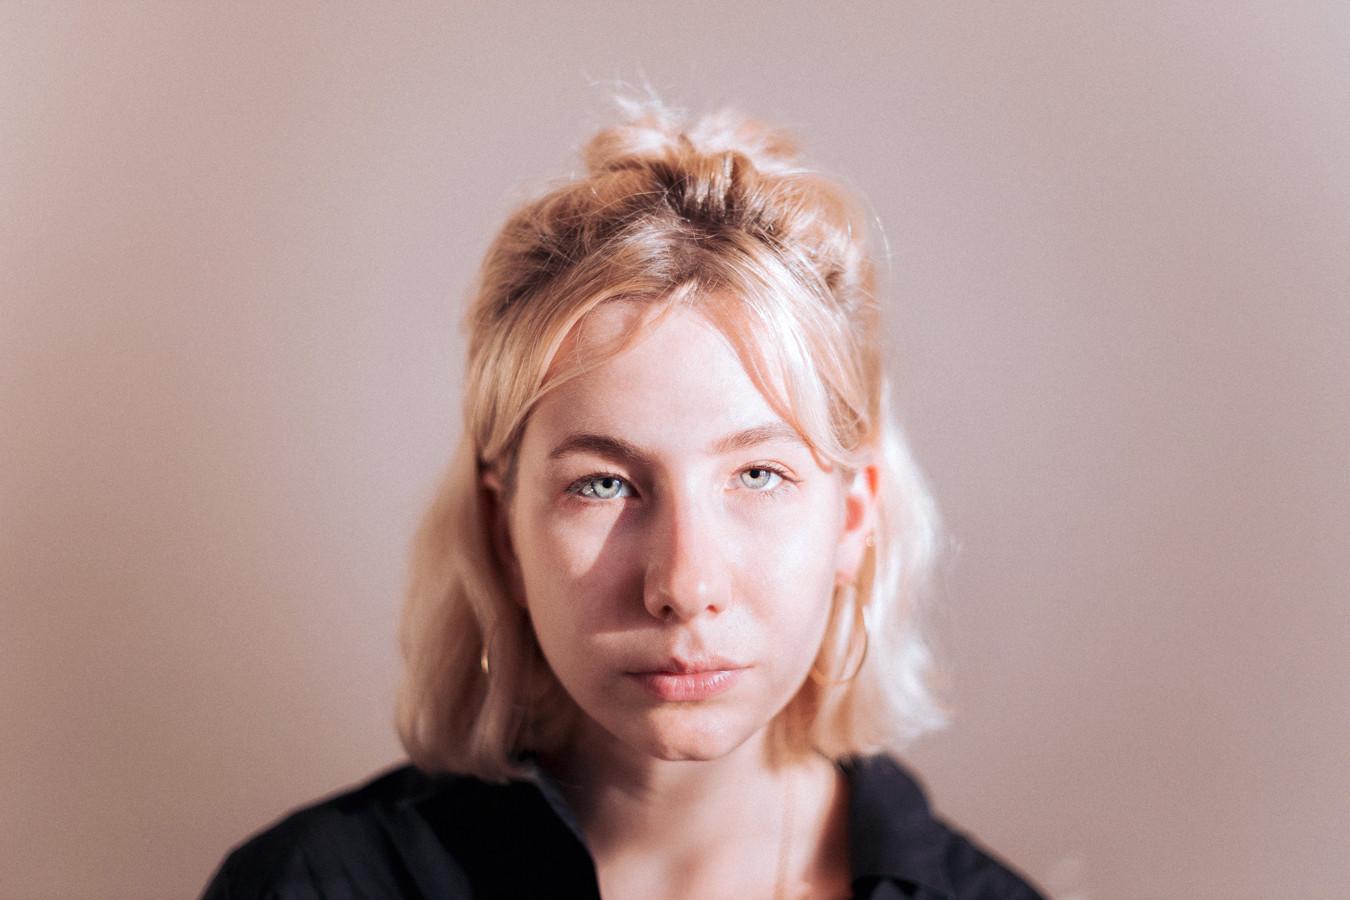 Portrait of my friend, Lili